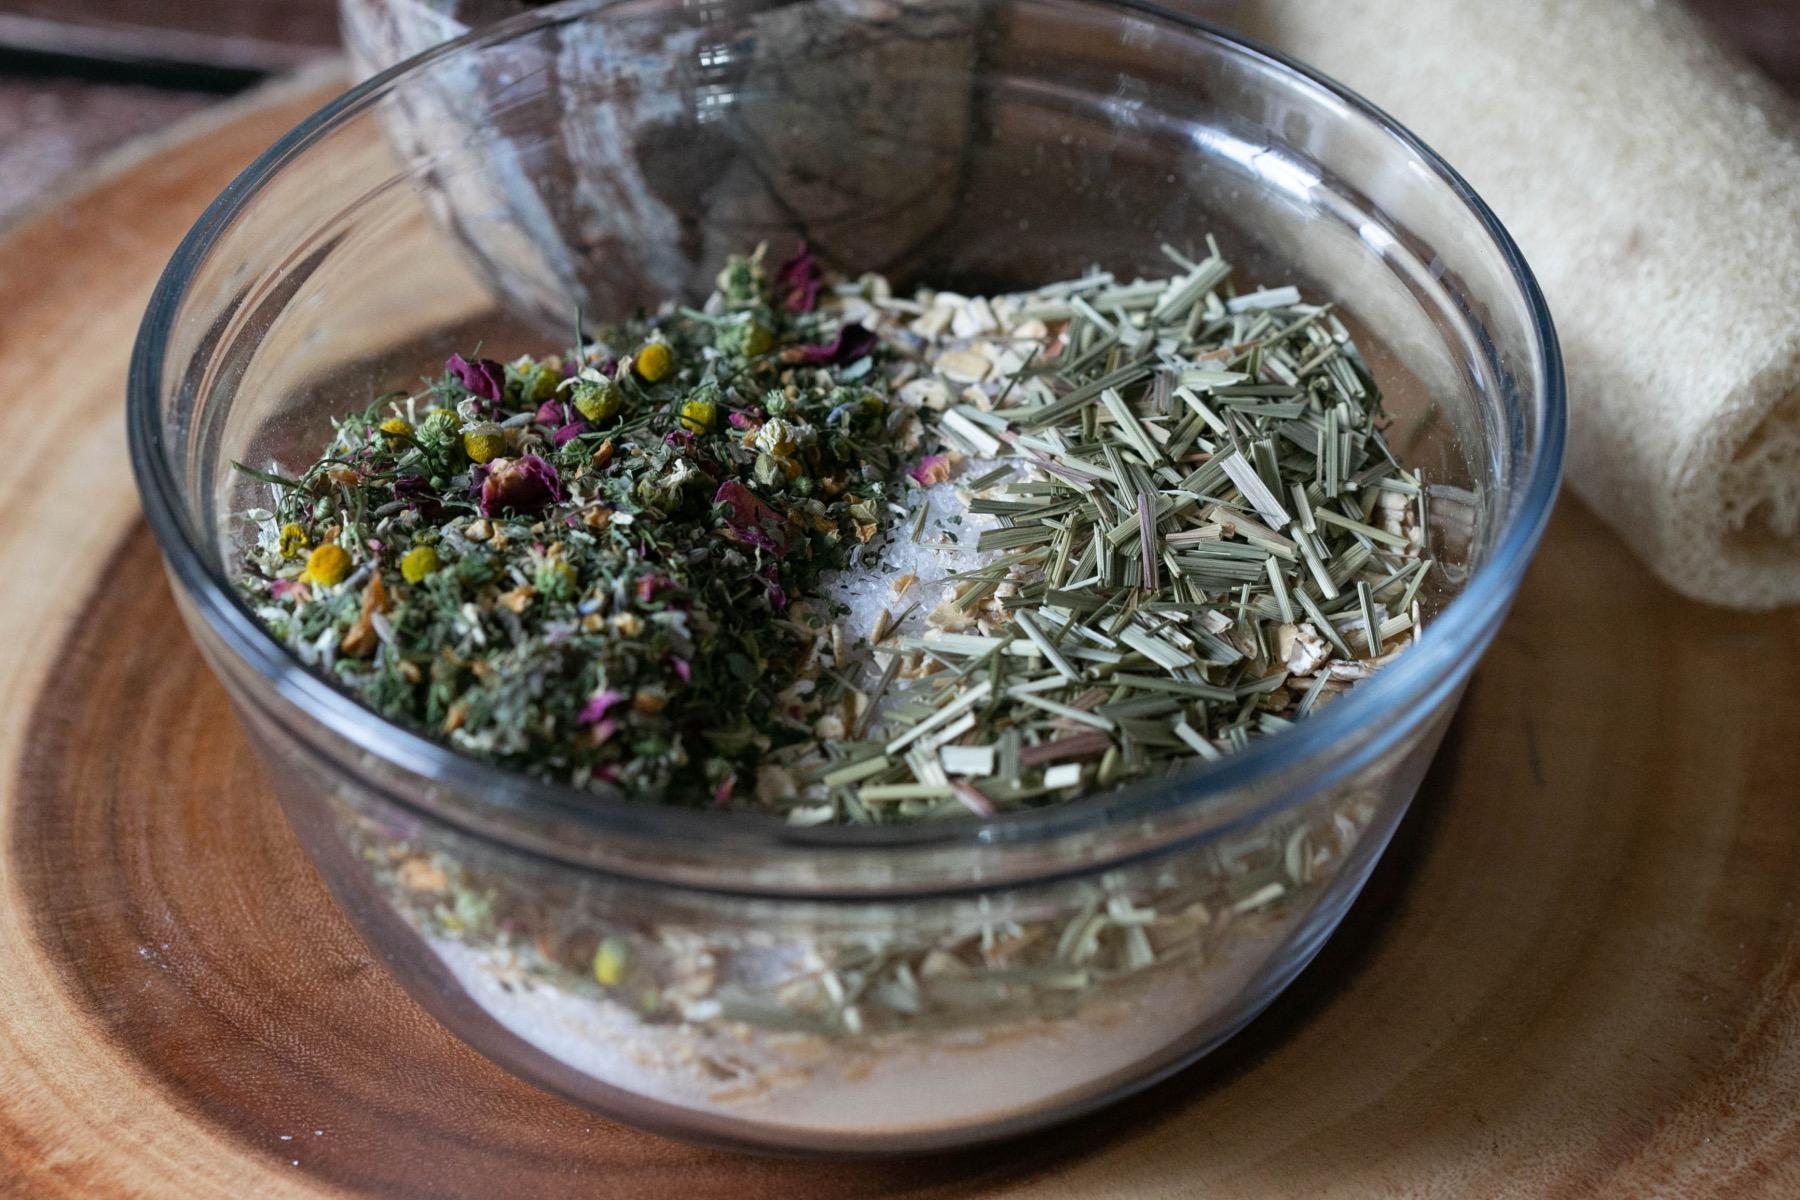 mix herbs into the oats and epsom salt - bath soak recipe